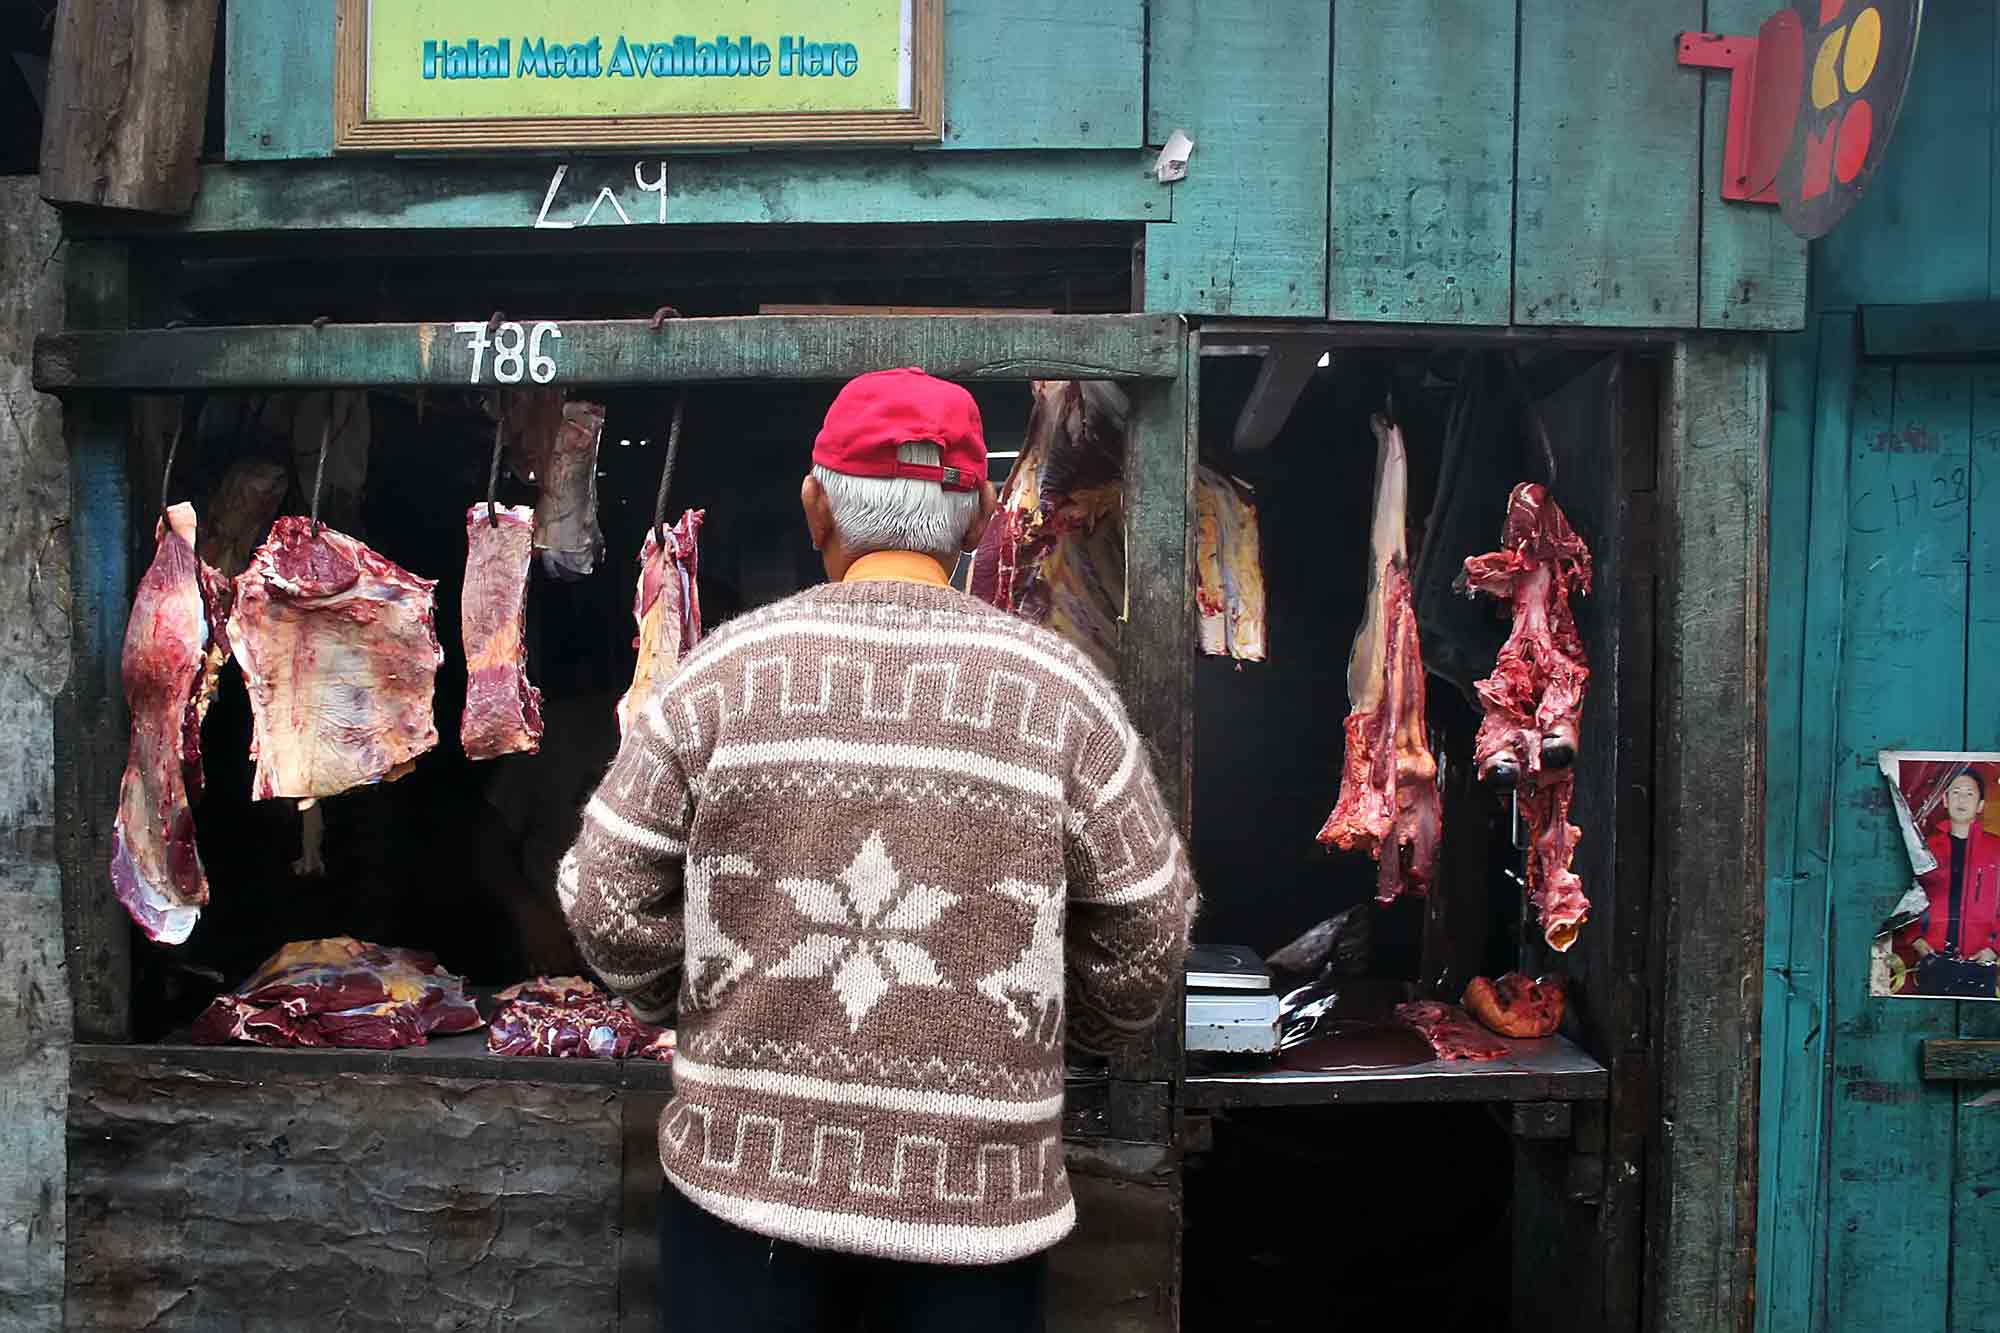 Halal meat shop in Darjeeling, India. © Ulli Maier & Nisa Maier